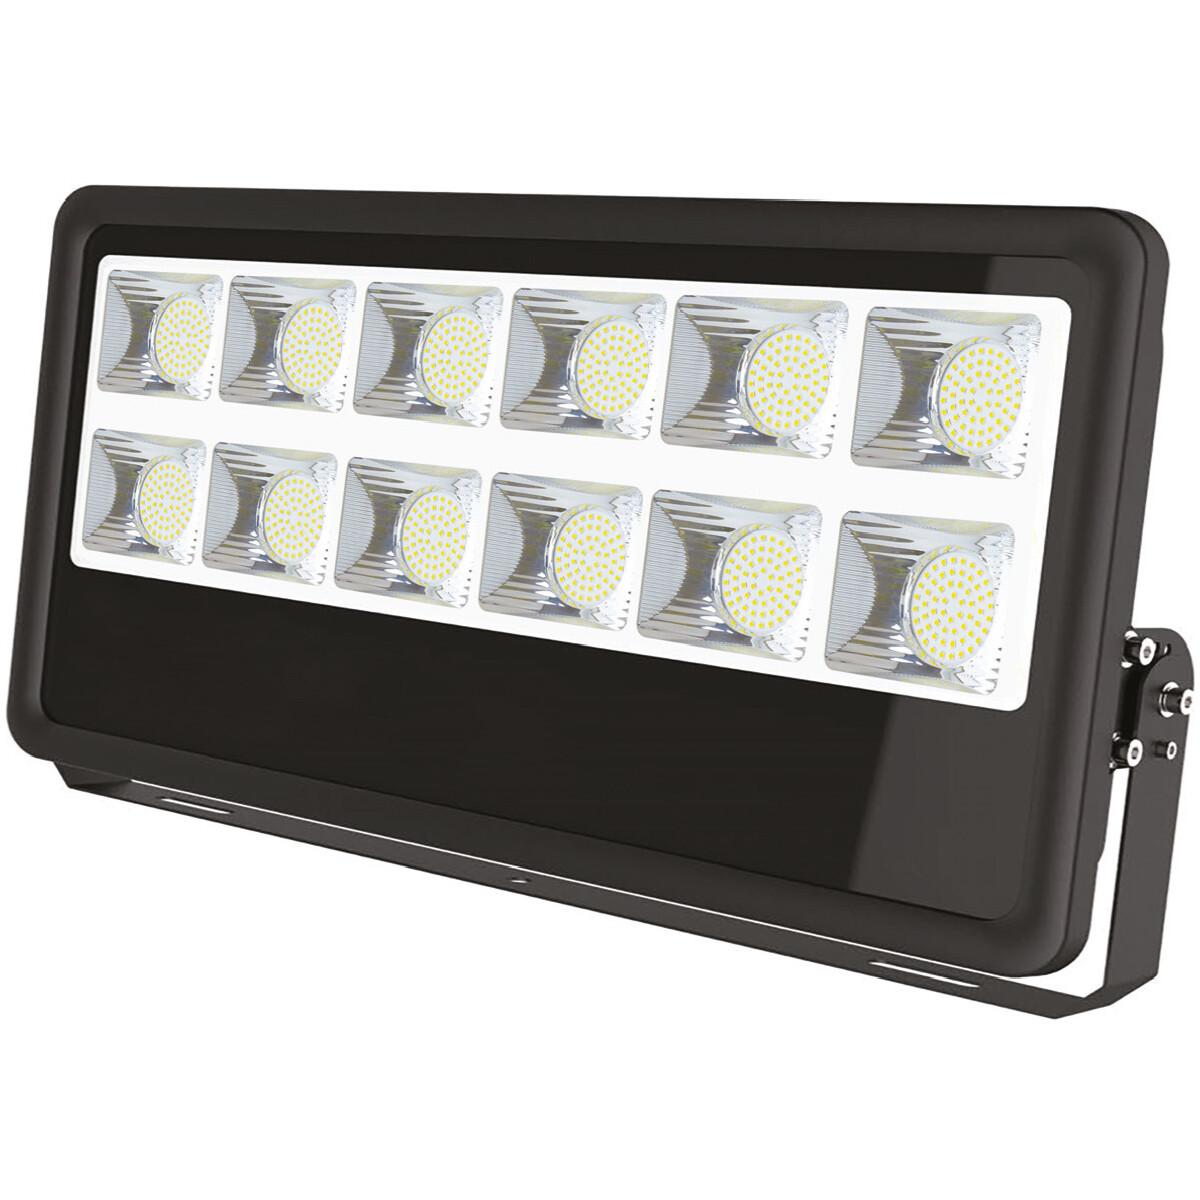 LED Bouwlamp 500 Watt - Leo - LED Schijnwerper - Helder/Koud Wit 6400K - Waterdicht IP65 - Mat Zwart